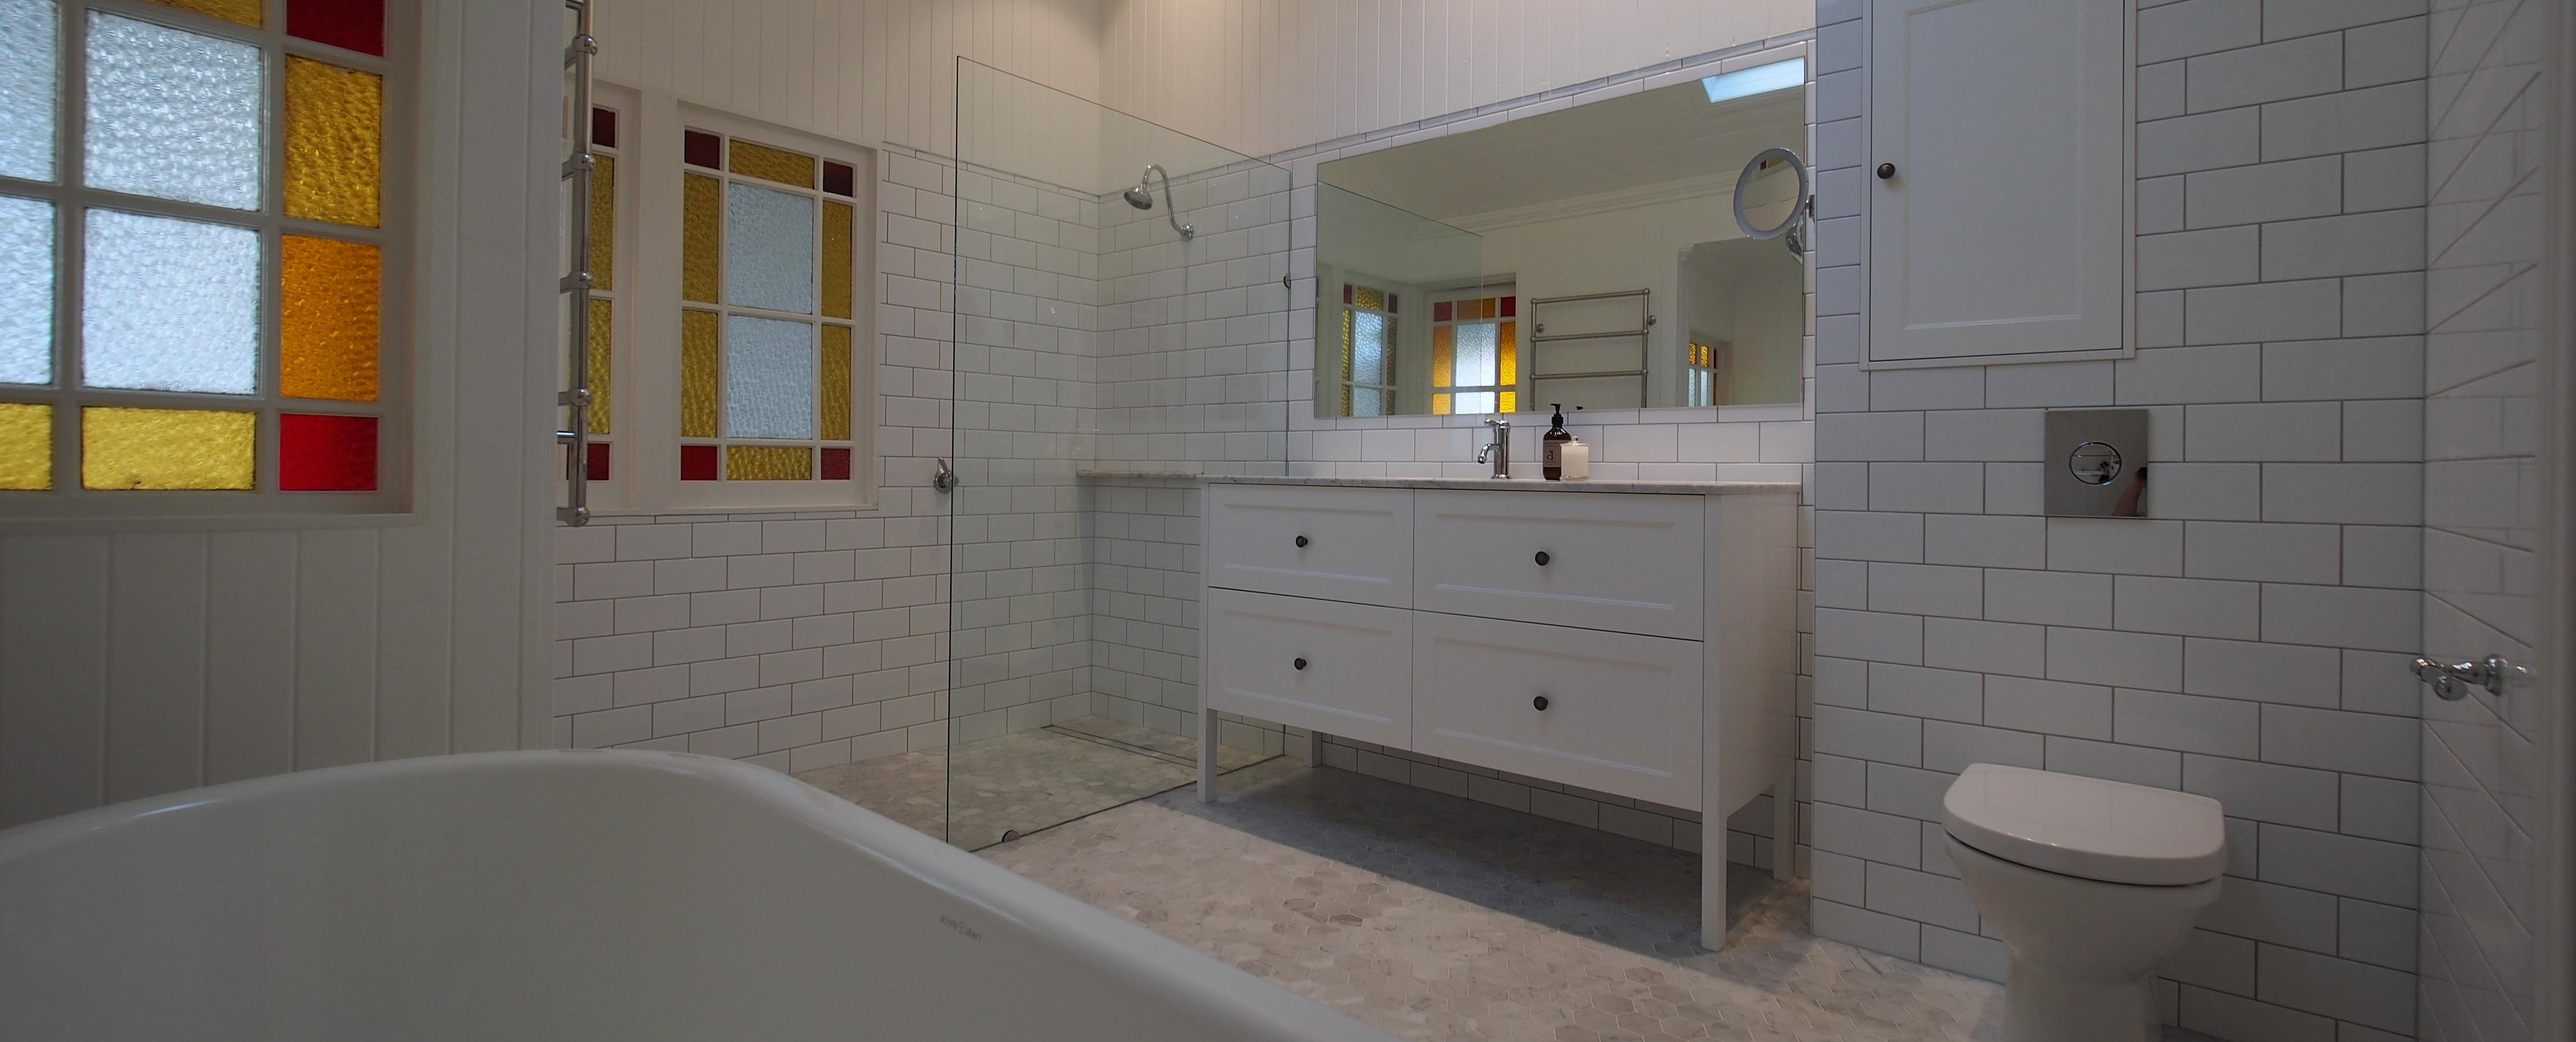 Bathroom Renovations D R King Plumbing